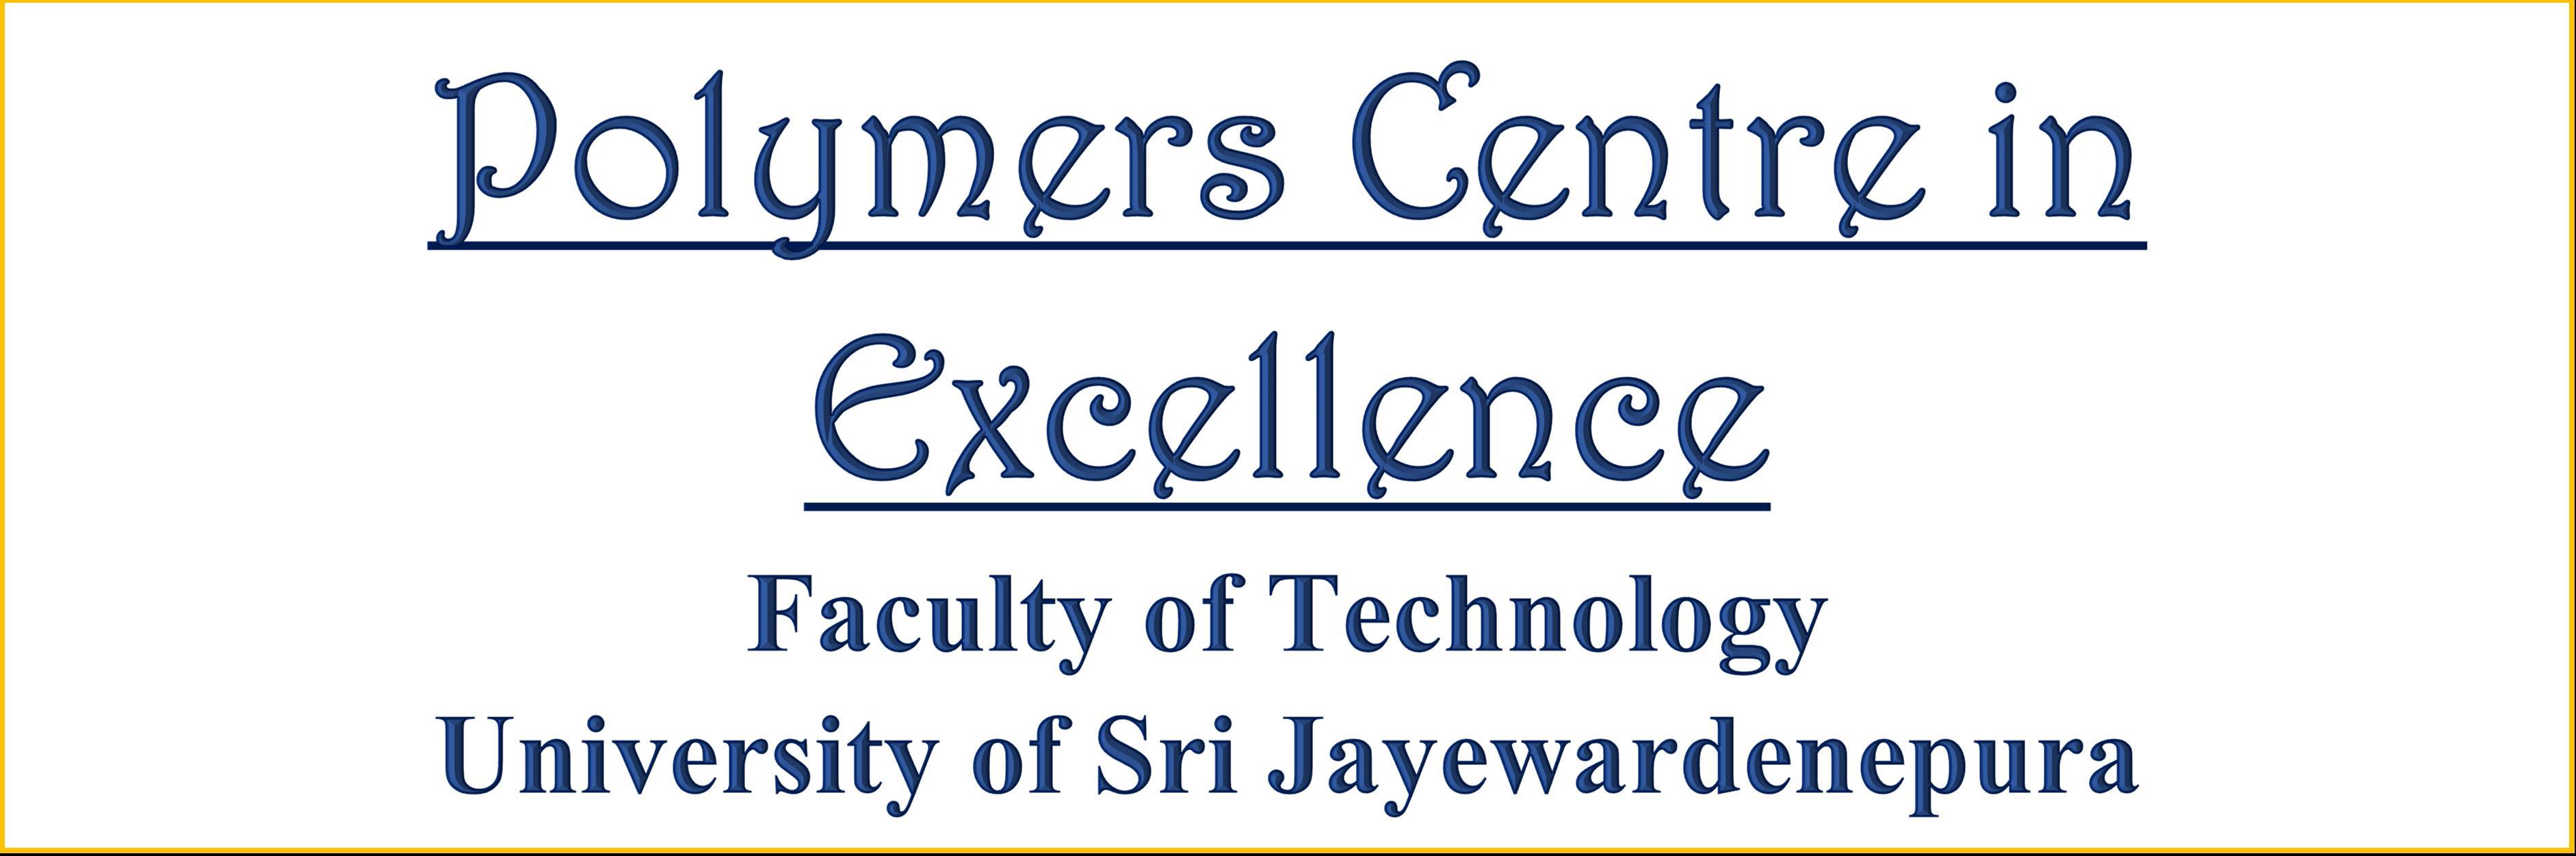 polymer center title